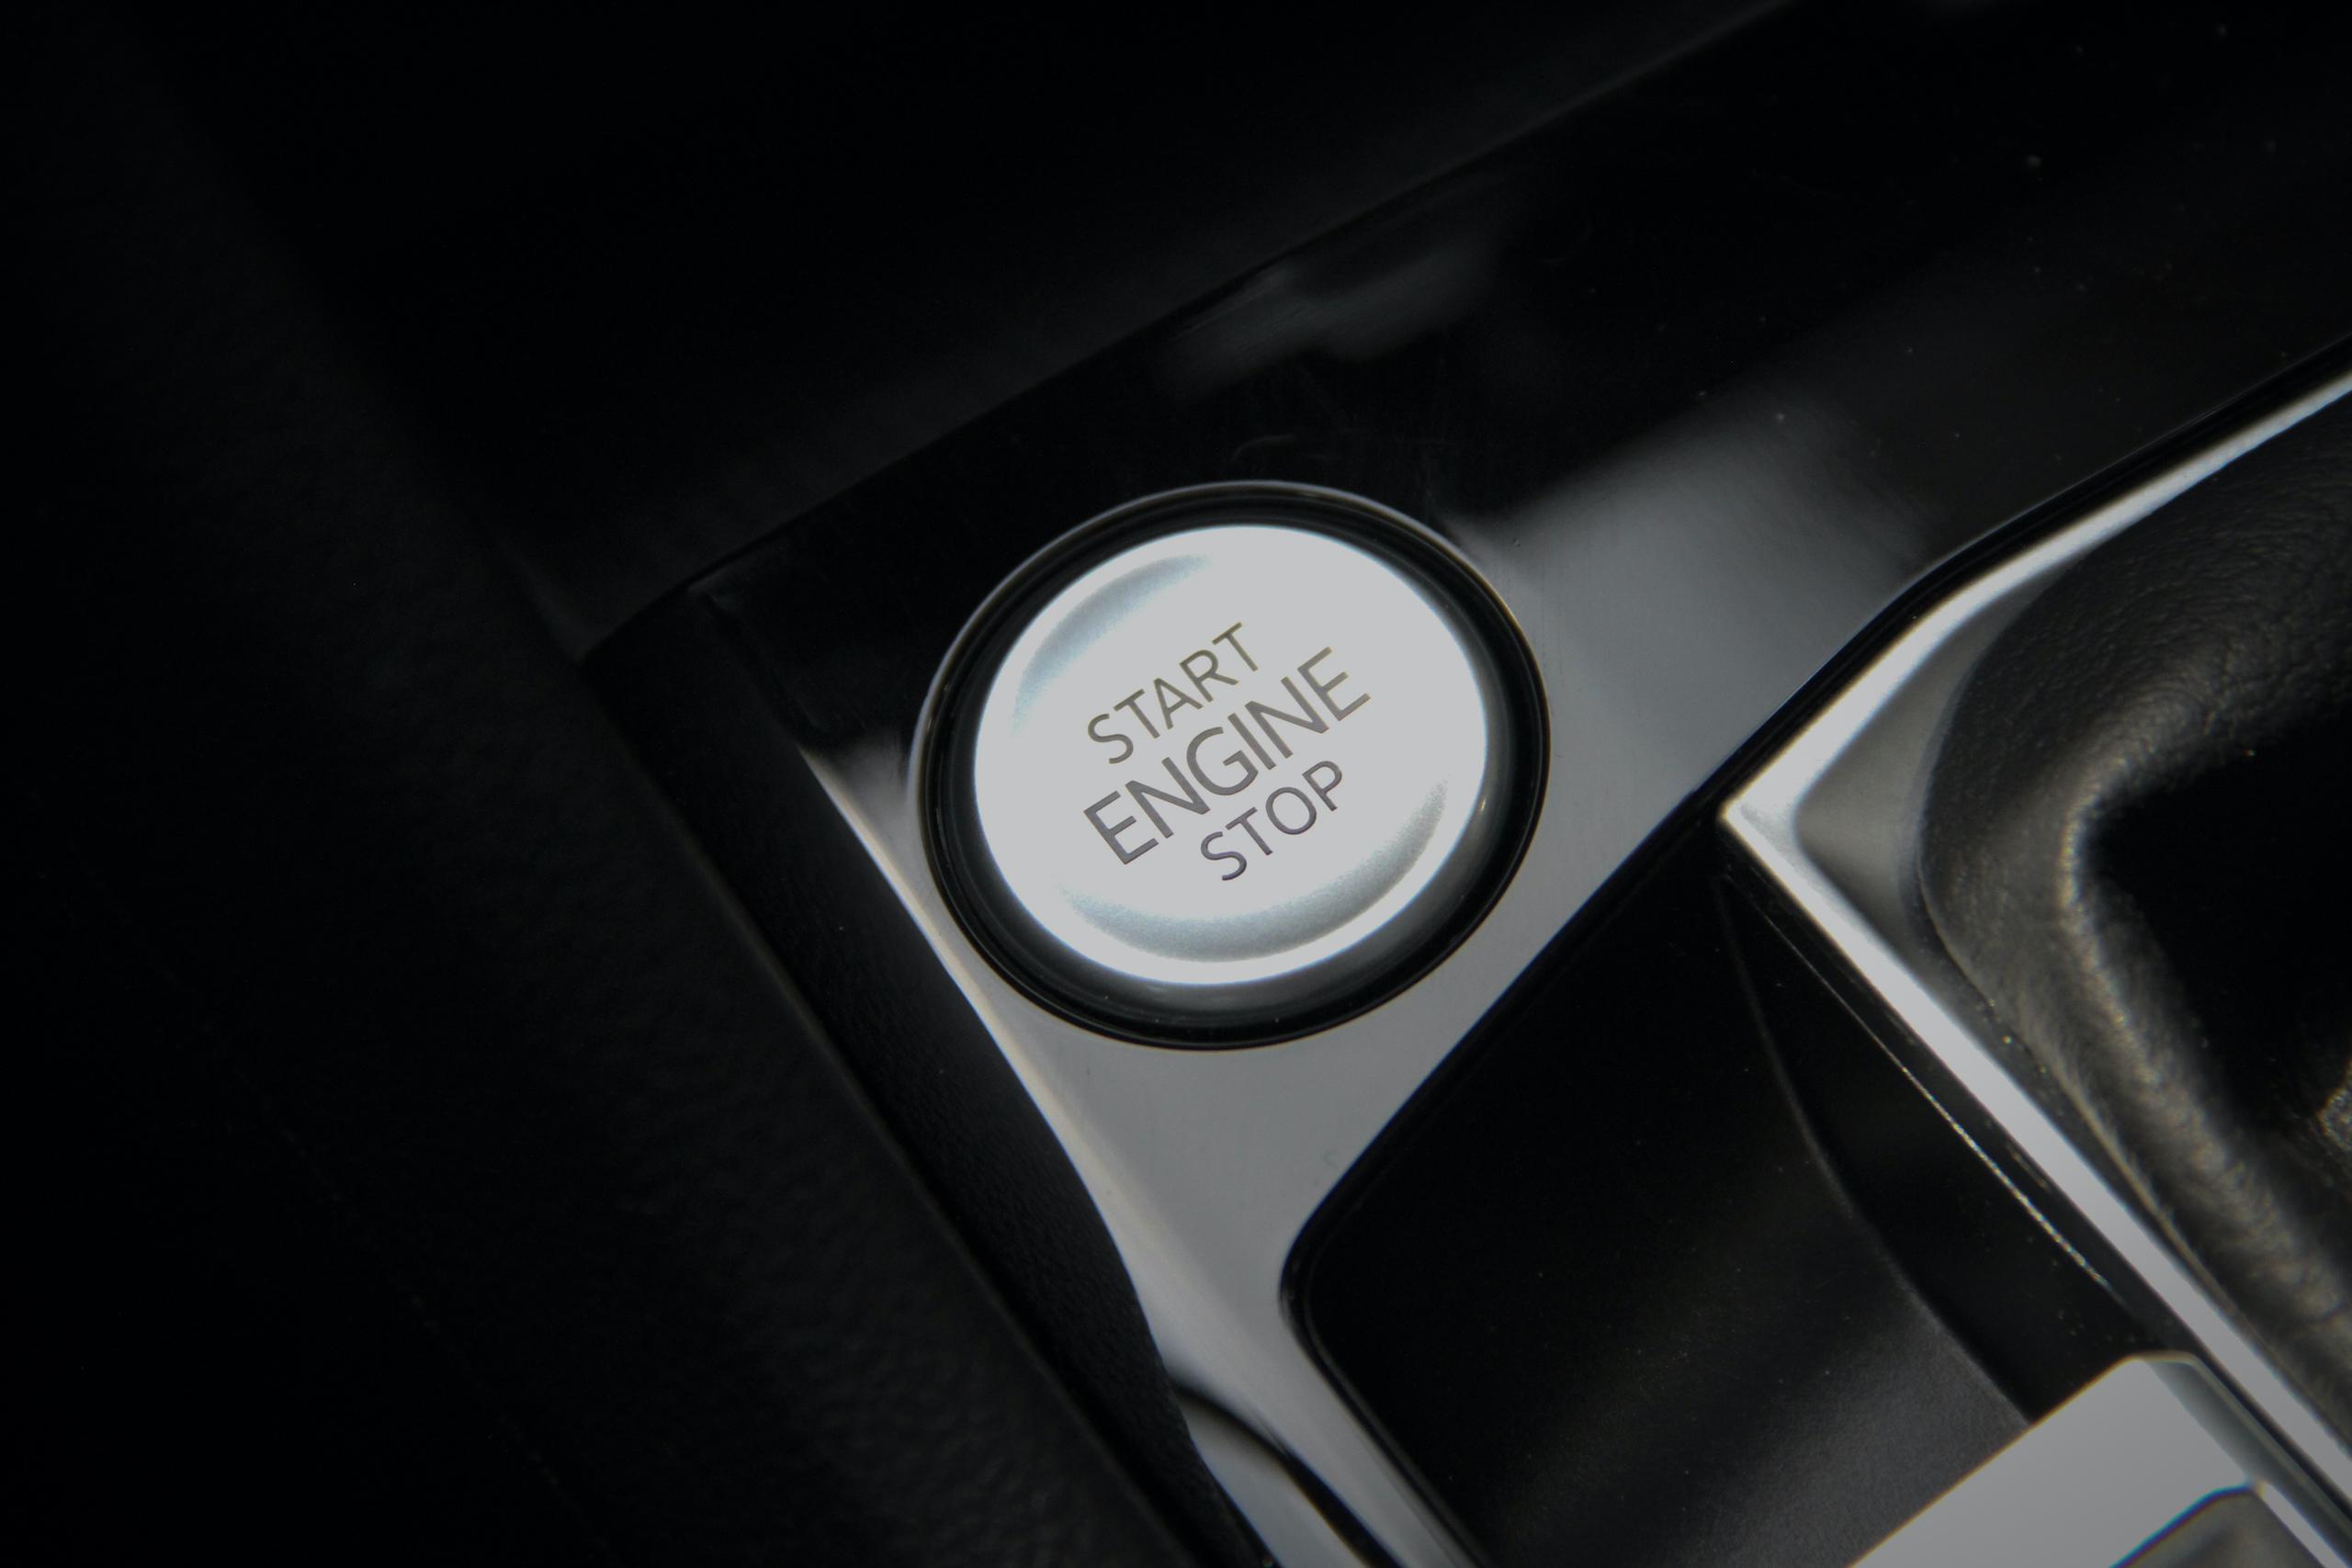 2022 Volkswagen Taos SEL AWD engine start stop